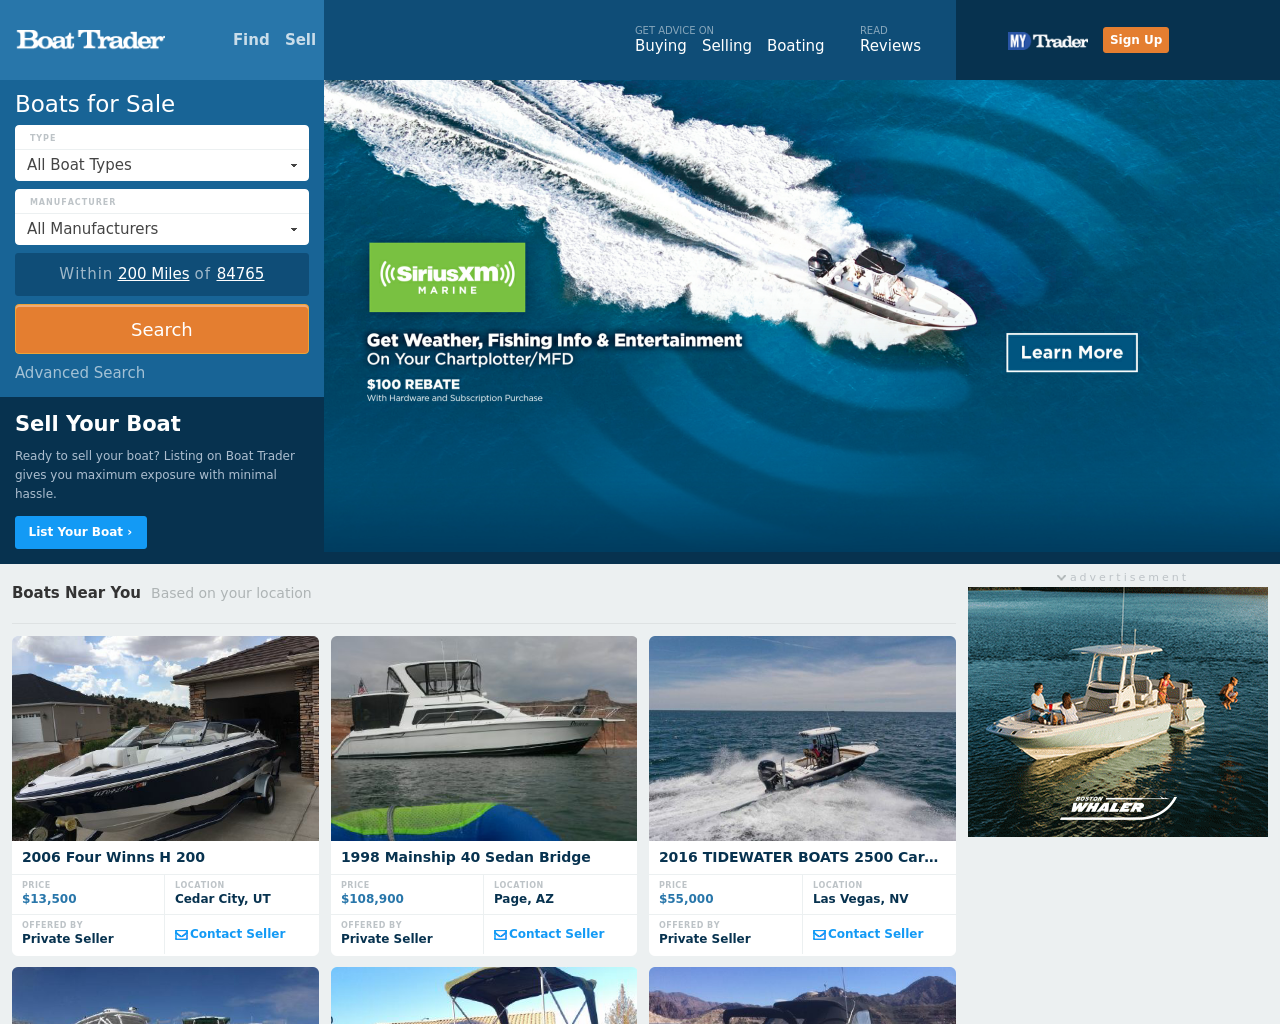 Boat-Trader-Advertising-Reviews-Pricing